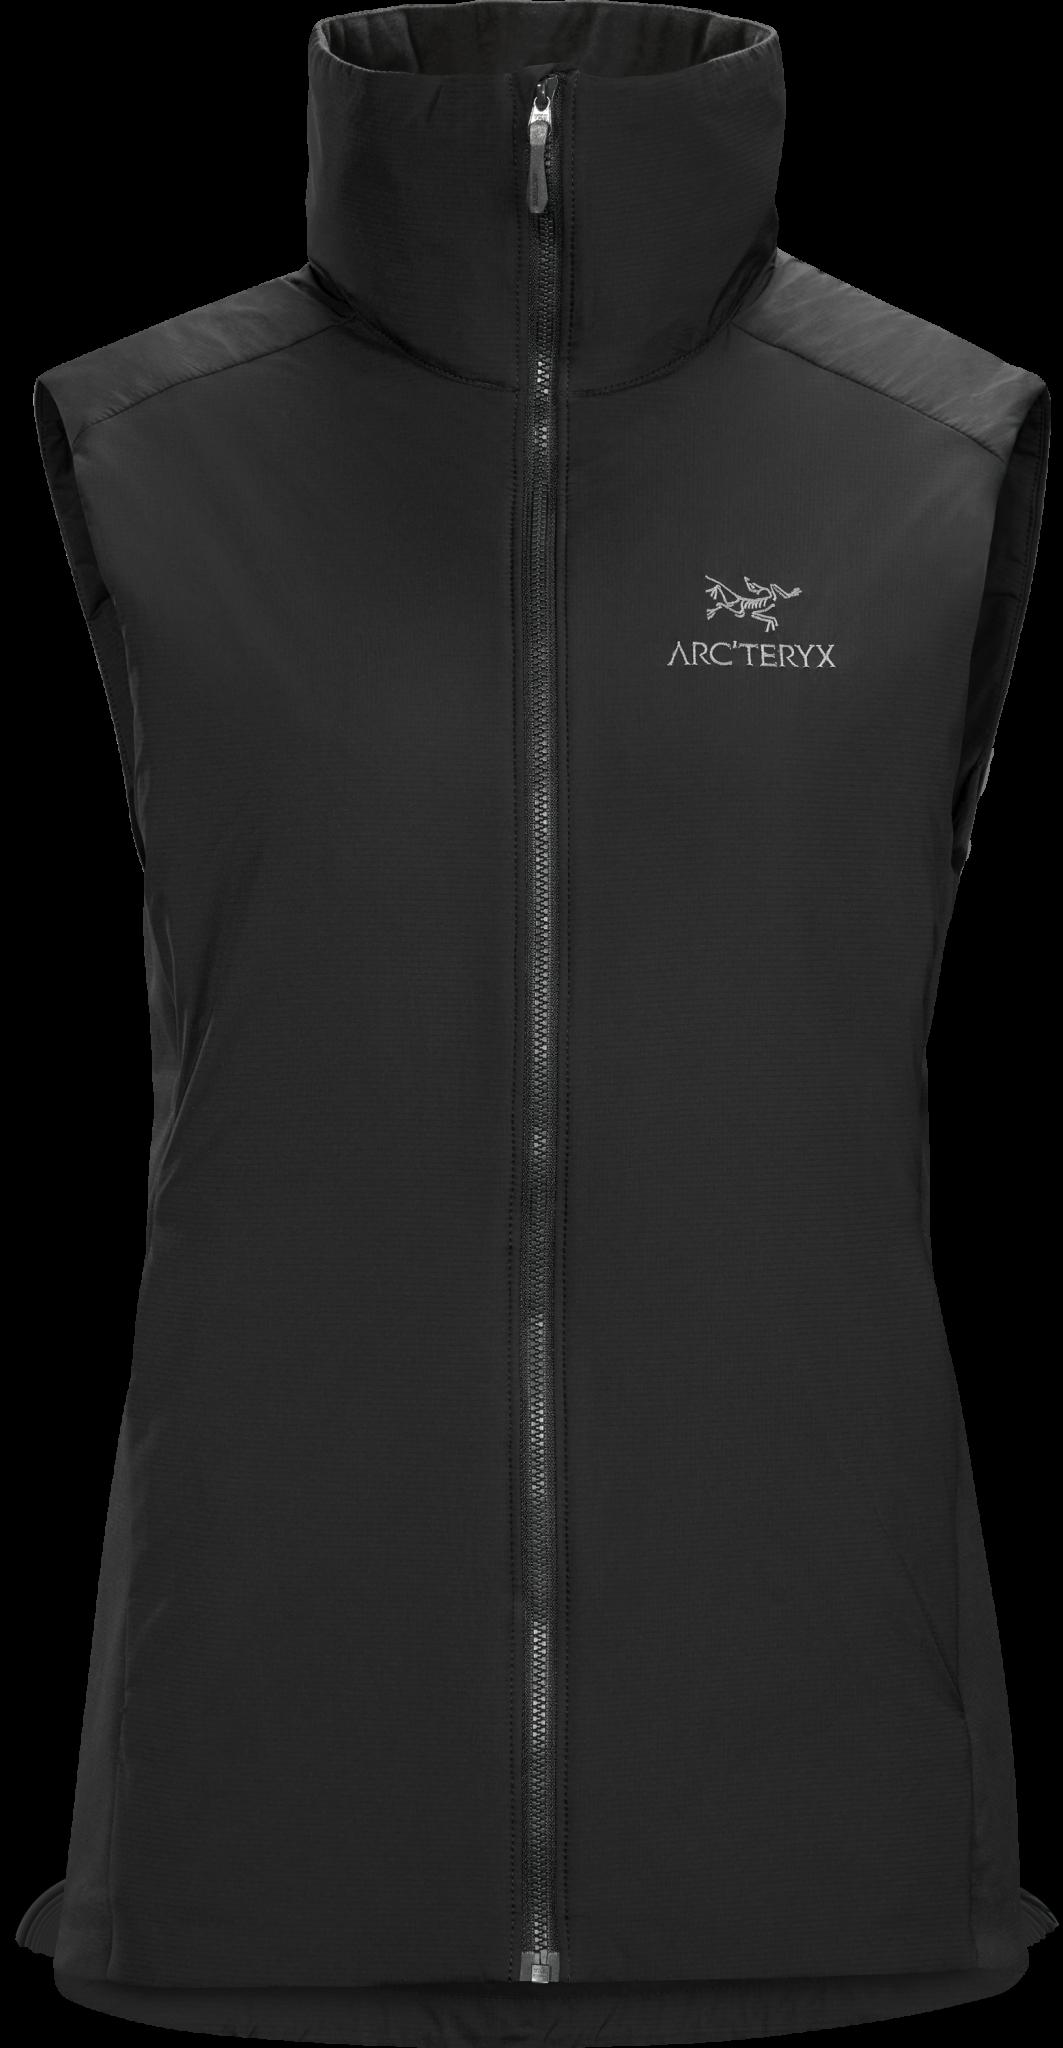 Arc'teryx Atom LT Vest Women's-4